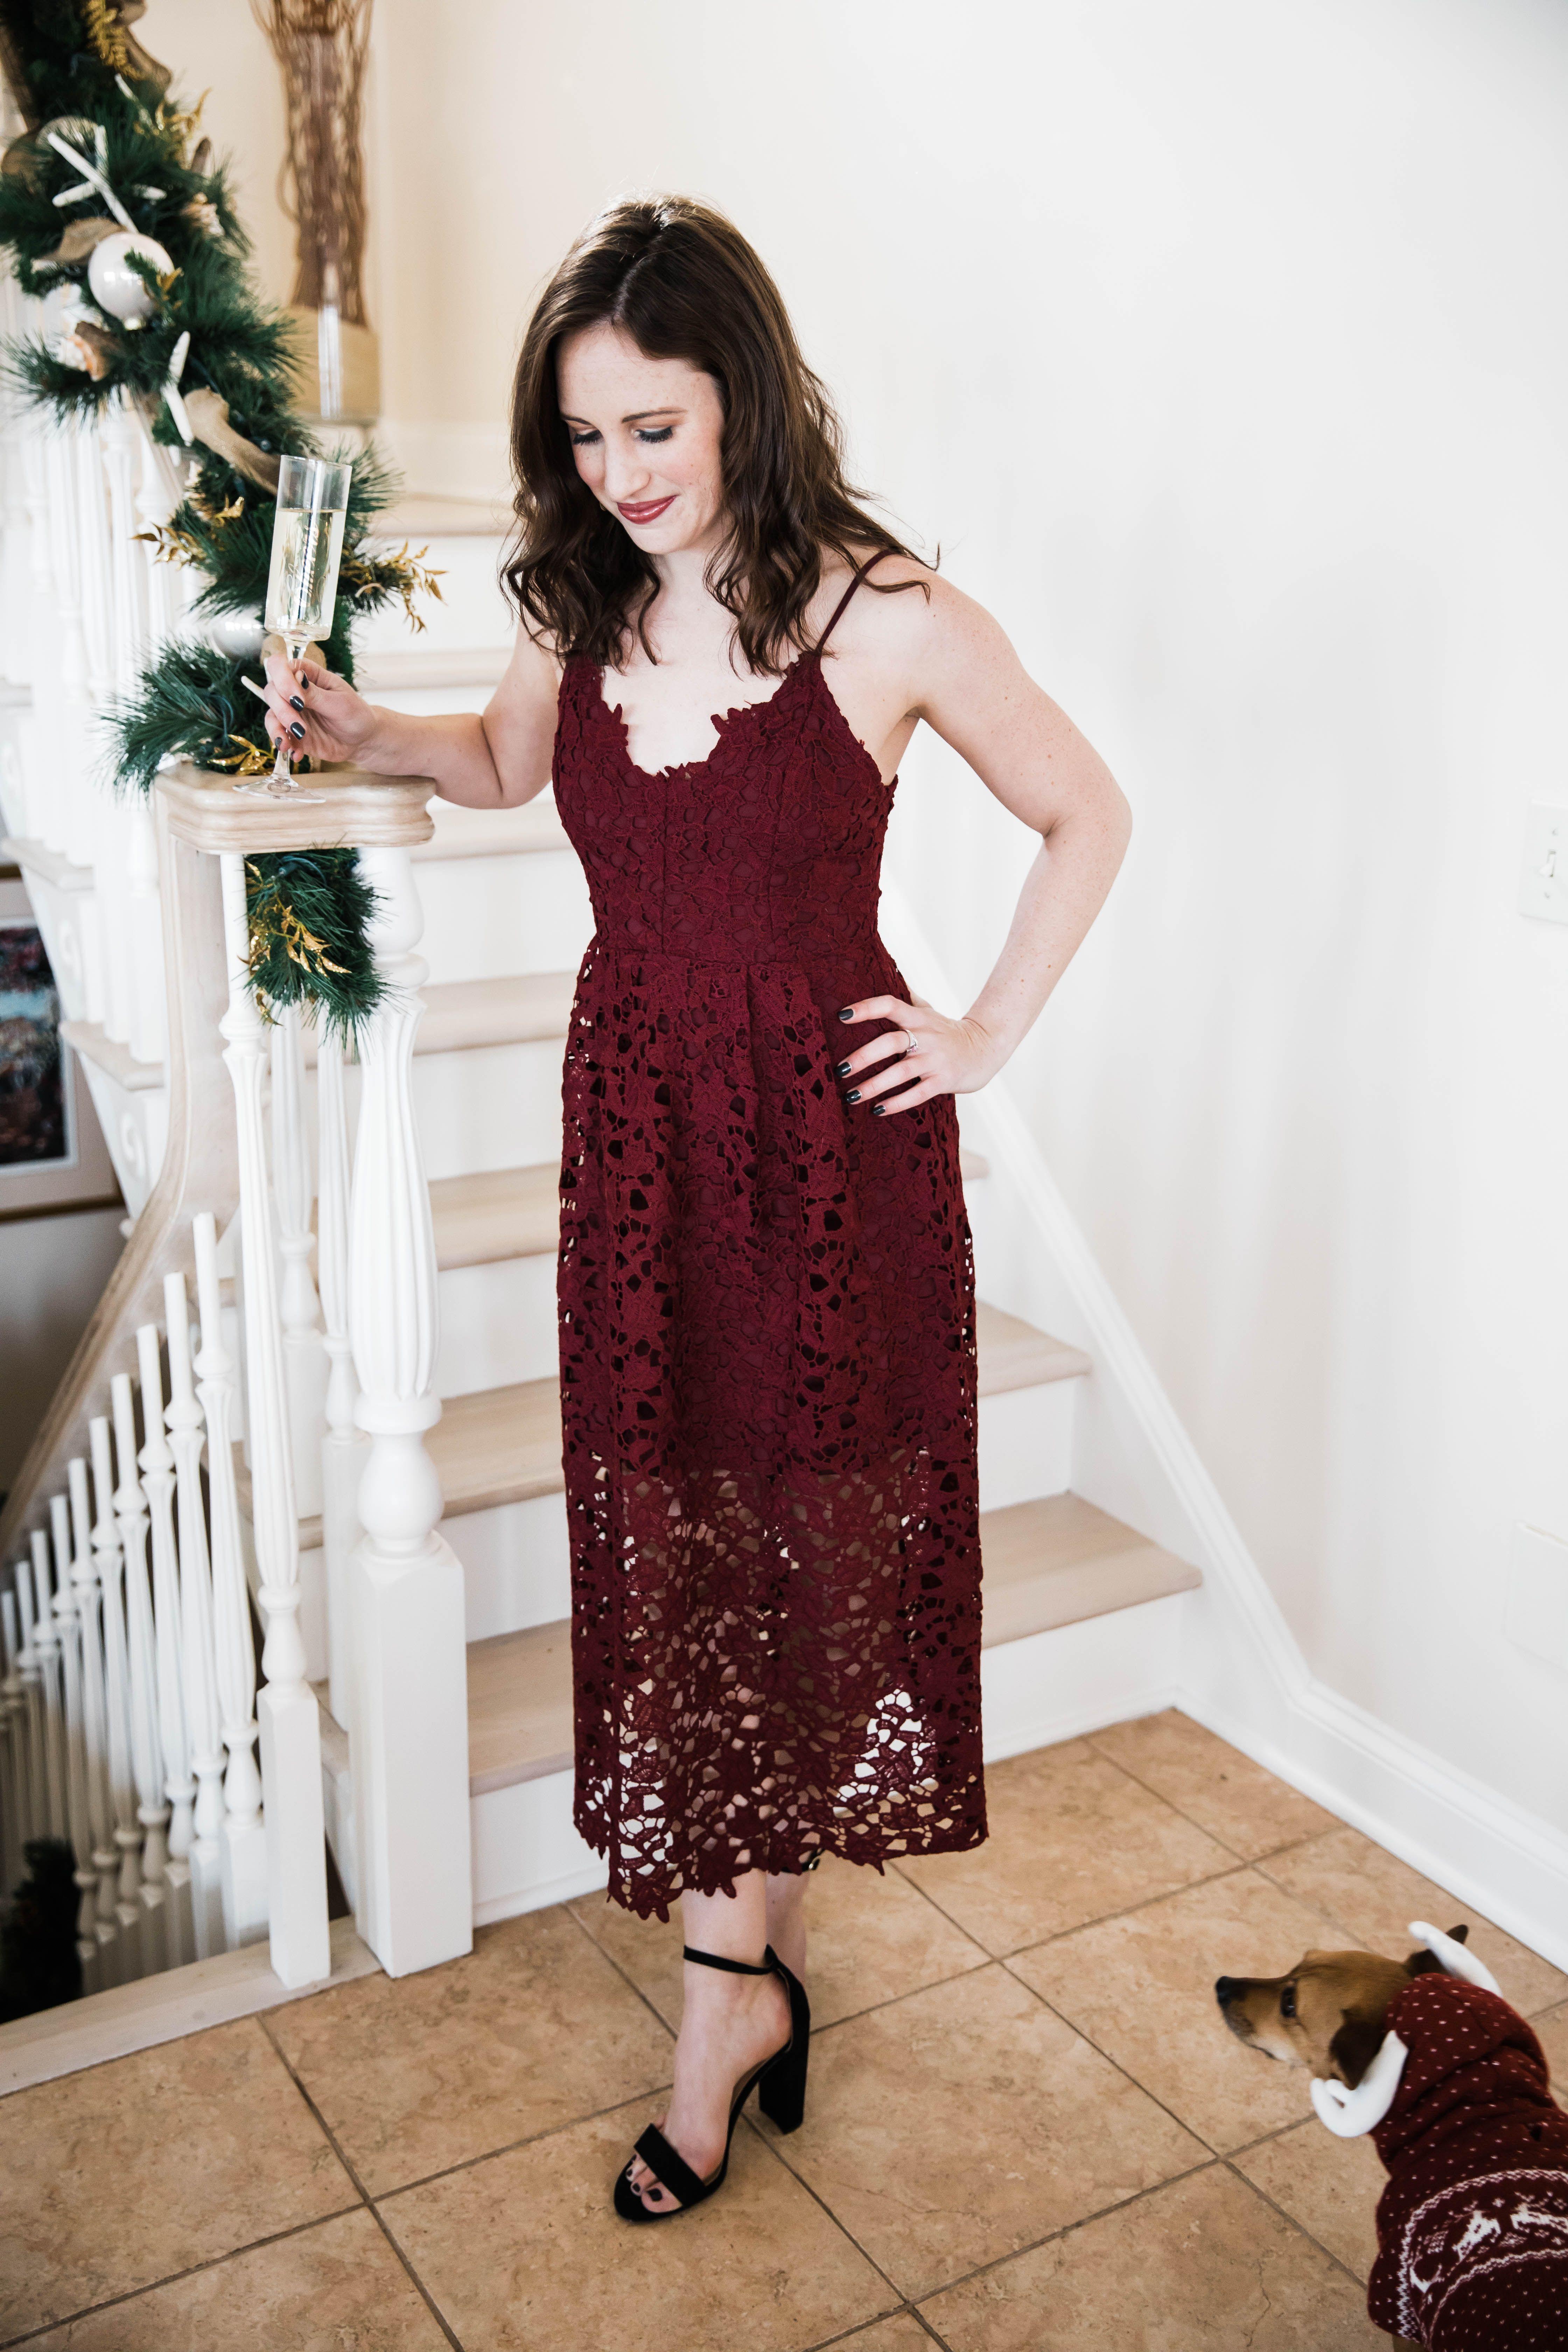 Winter Wedding Guest Dress Holiday Dress Burgundy Lace Black